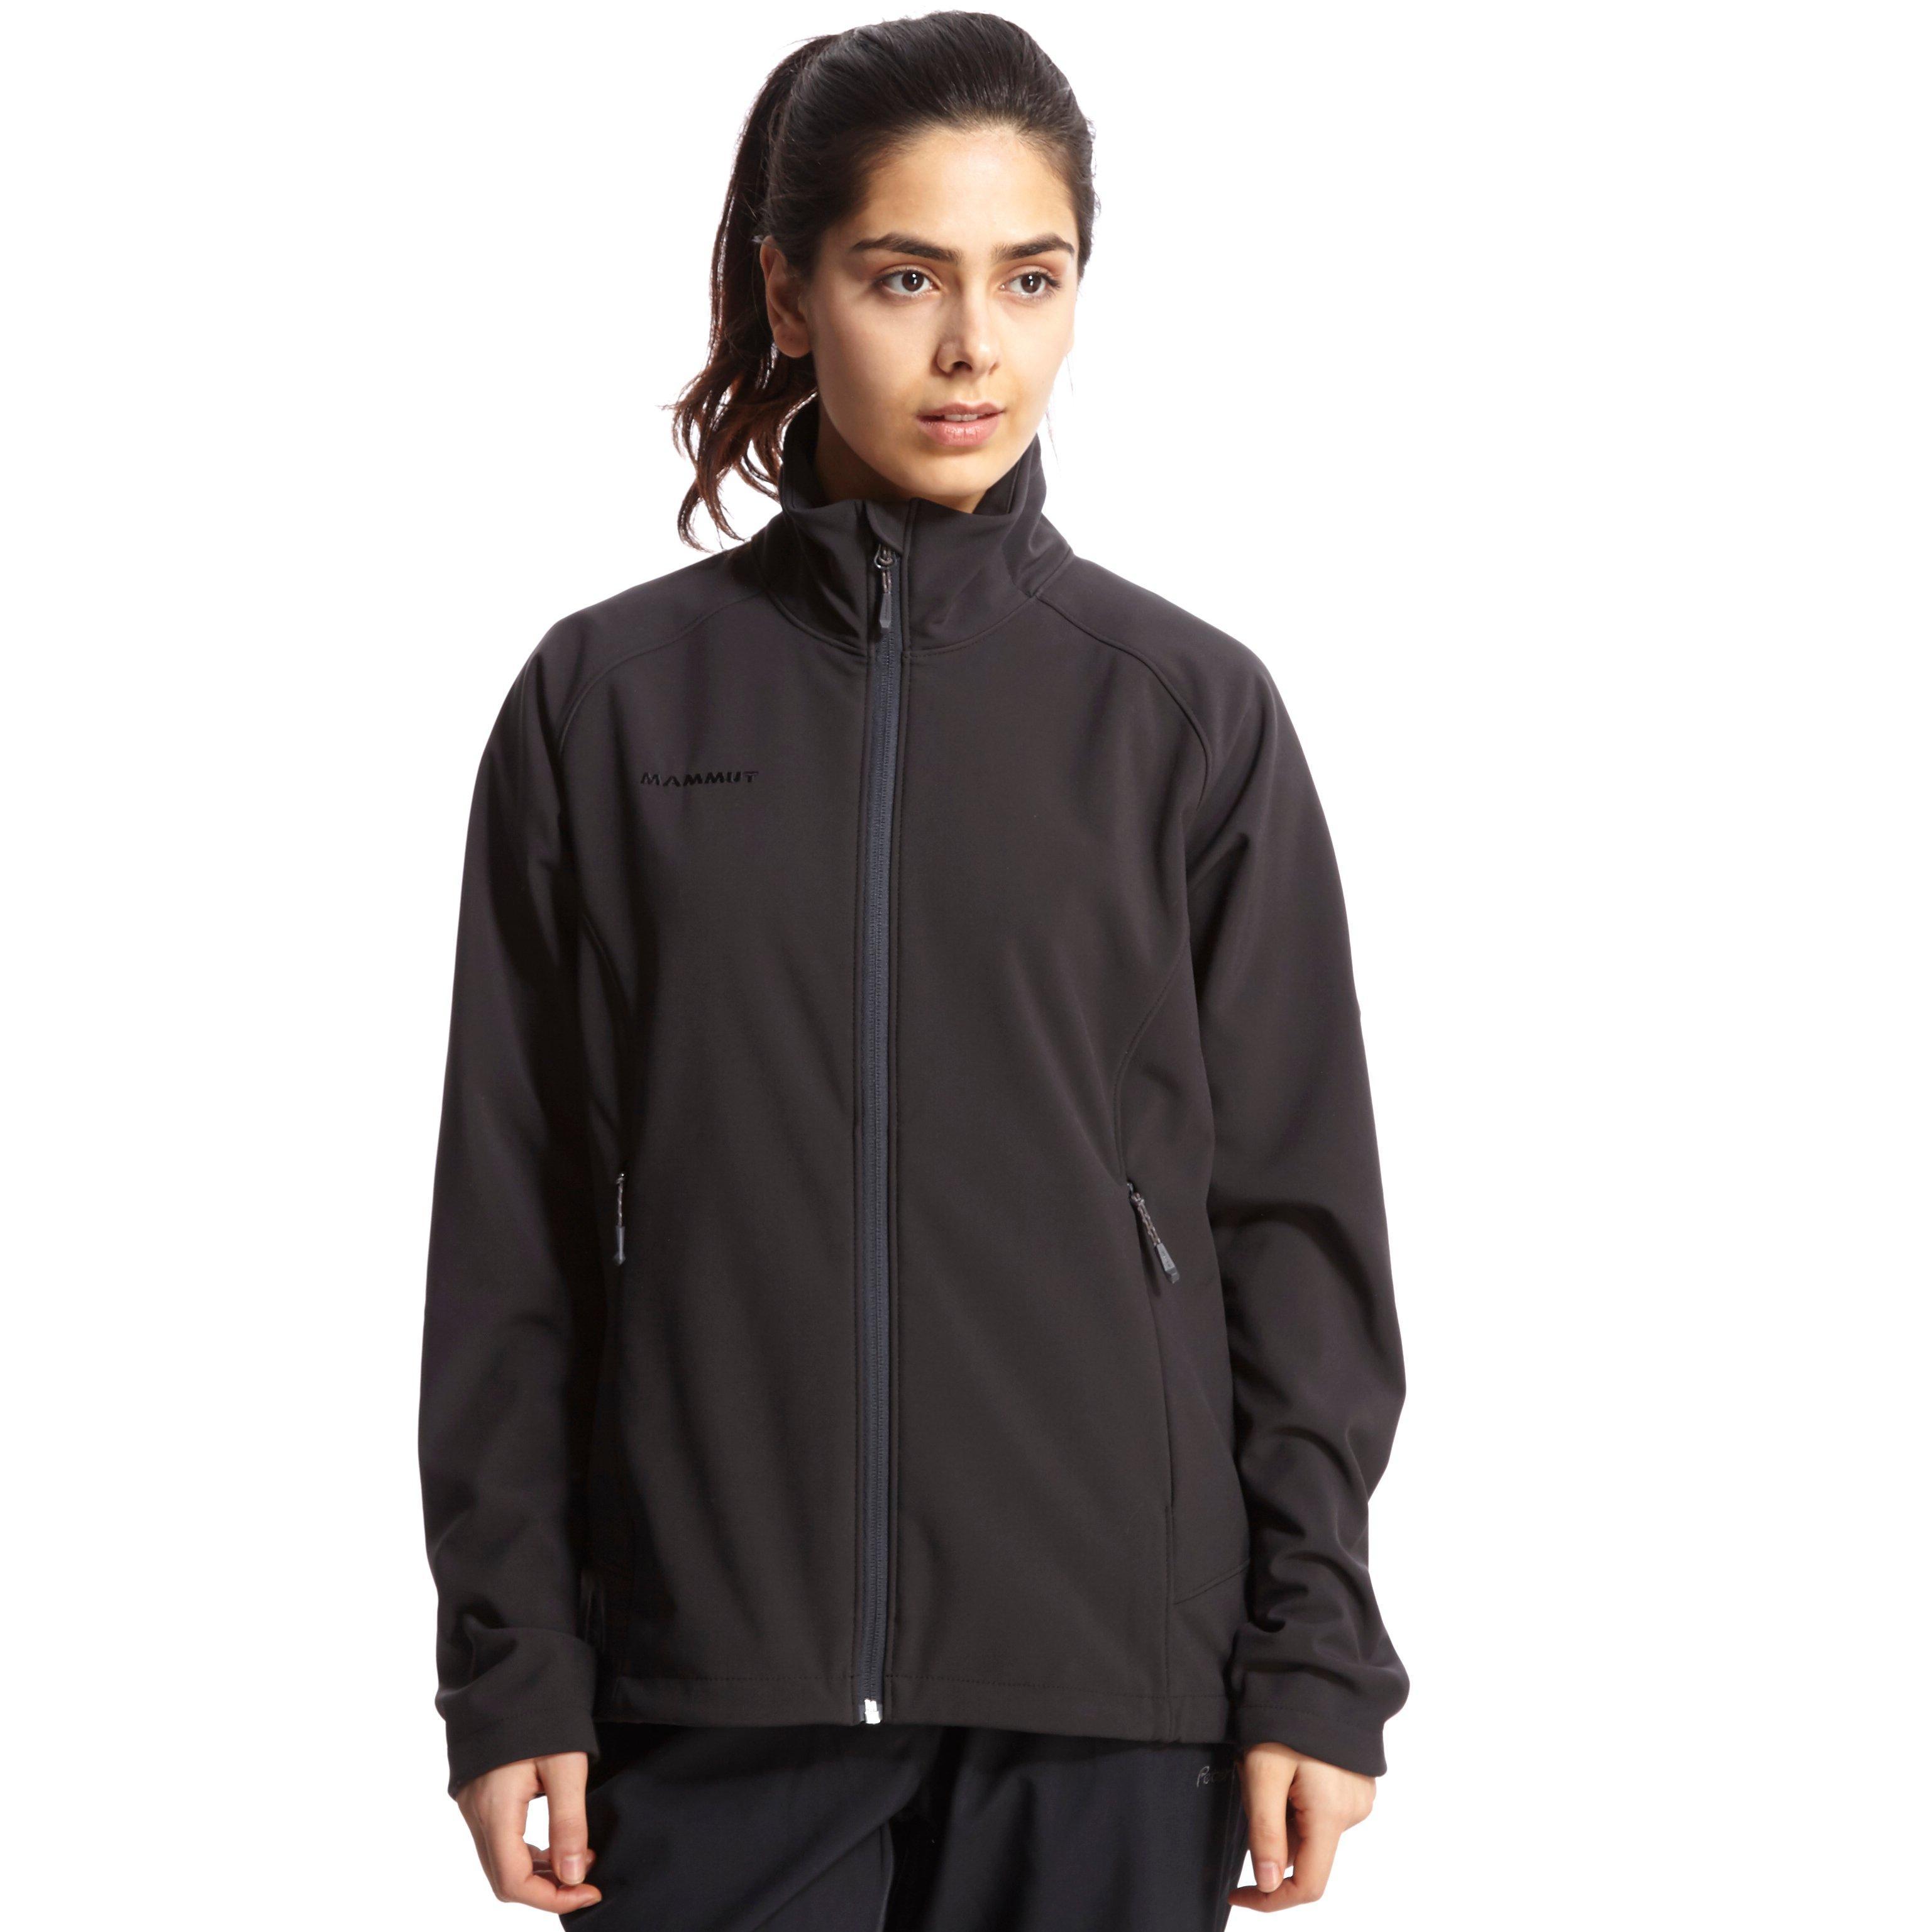 Mammut Womens Ladakh Softshell Jacket Black